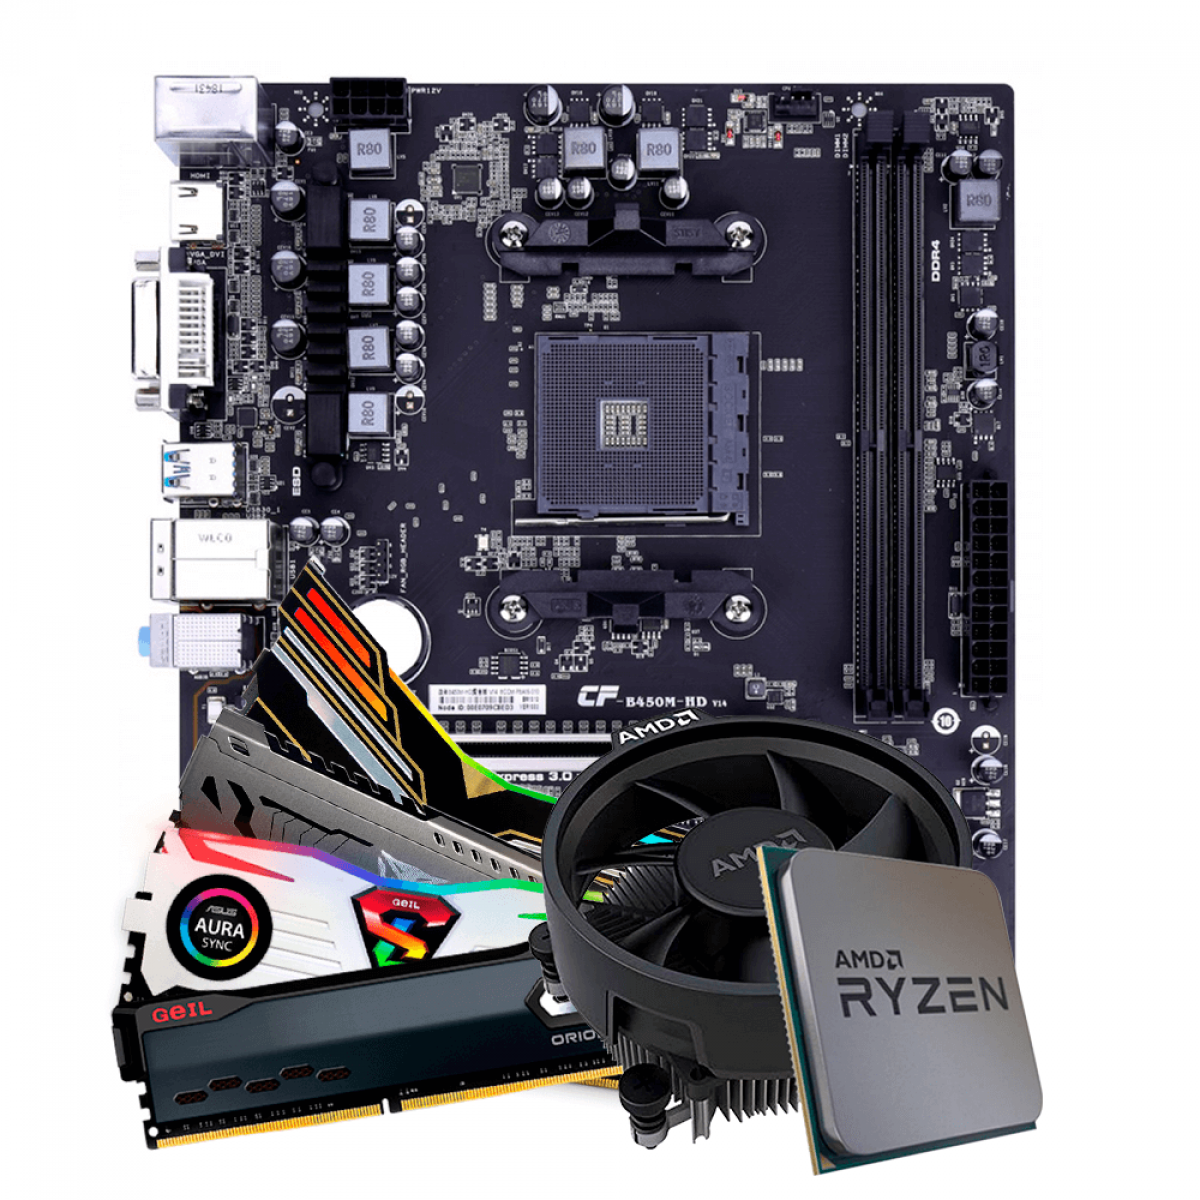 Kit Upgrade, AMD Ryzen 5 PRO 4650G, Colorful Battle-AX B450M-HD V14, Memória DDR4 16GB (2x8GB) 3000MHz